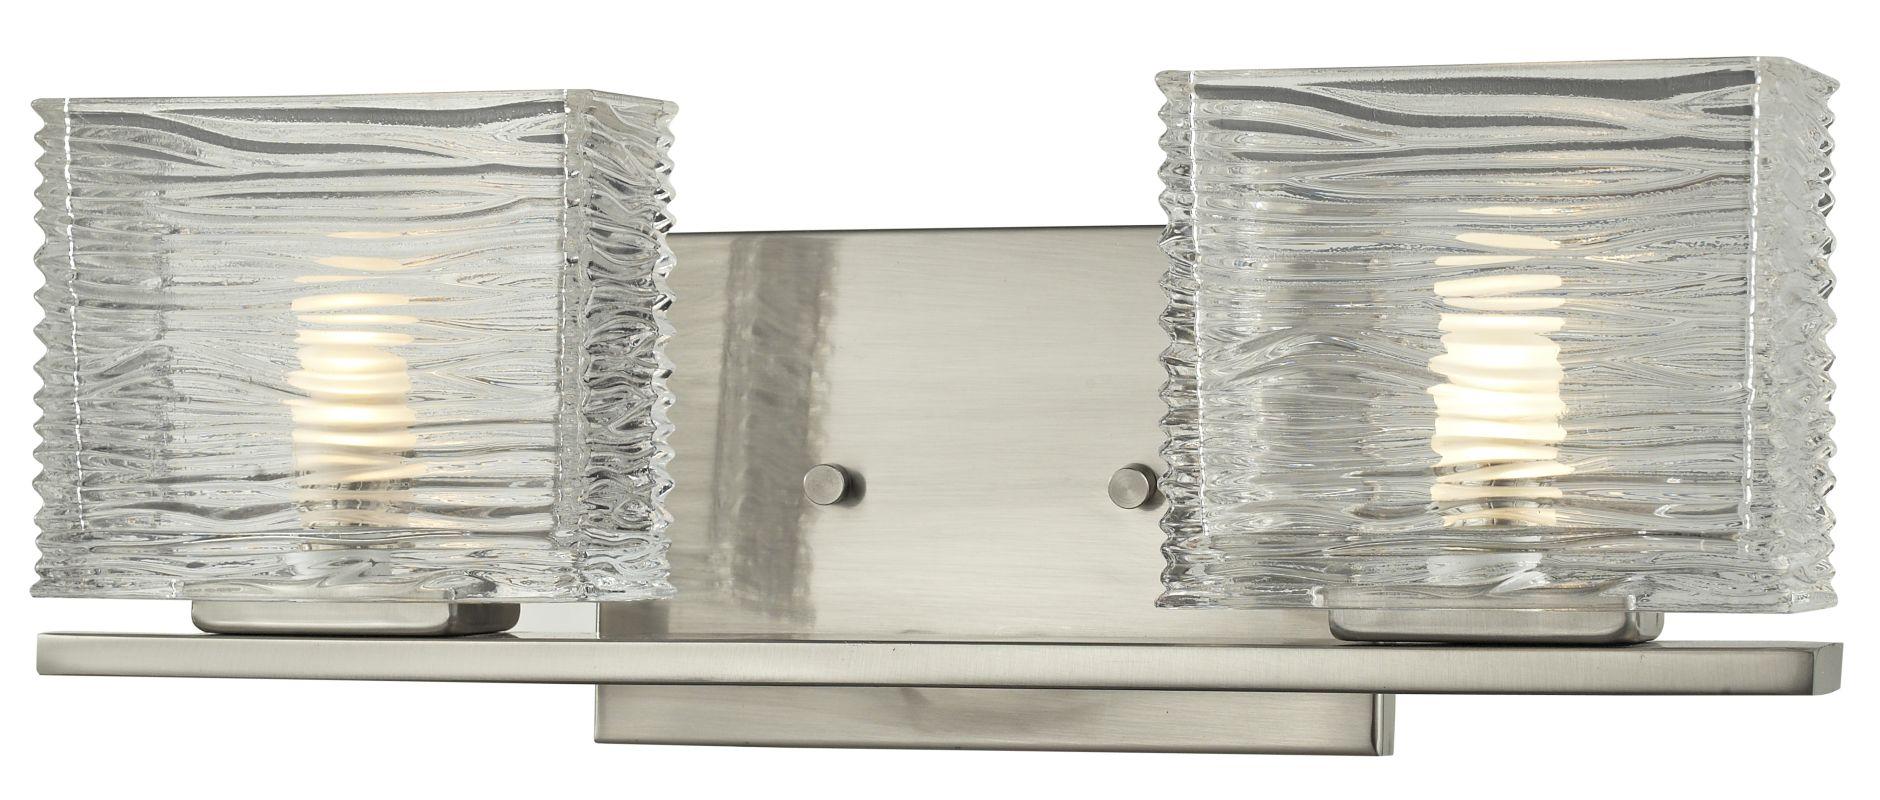 Z-Lite 3024-2V Jaol 2 Light ADA Compliant Bathroom Vanity Light with